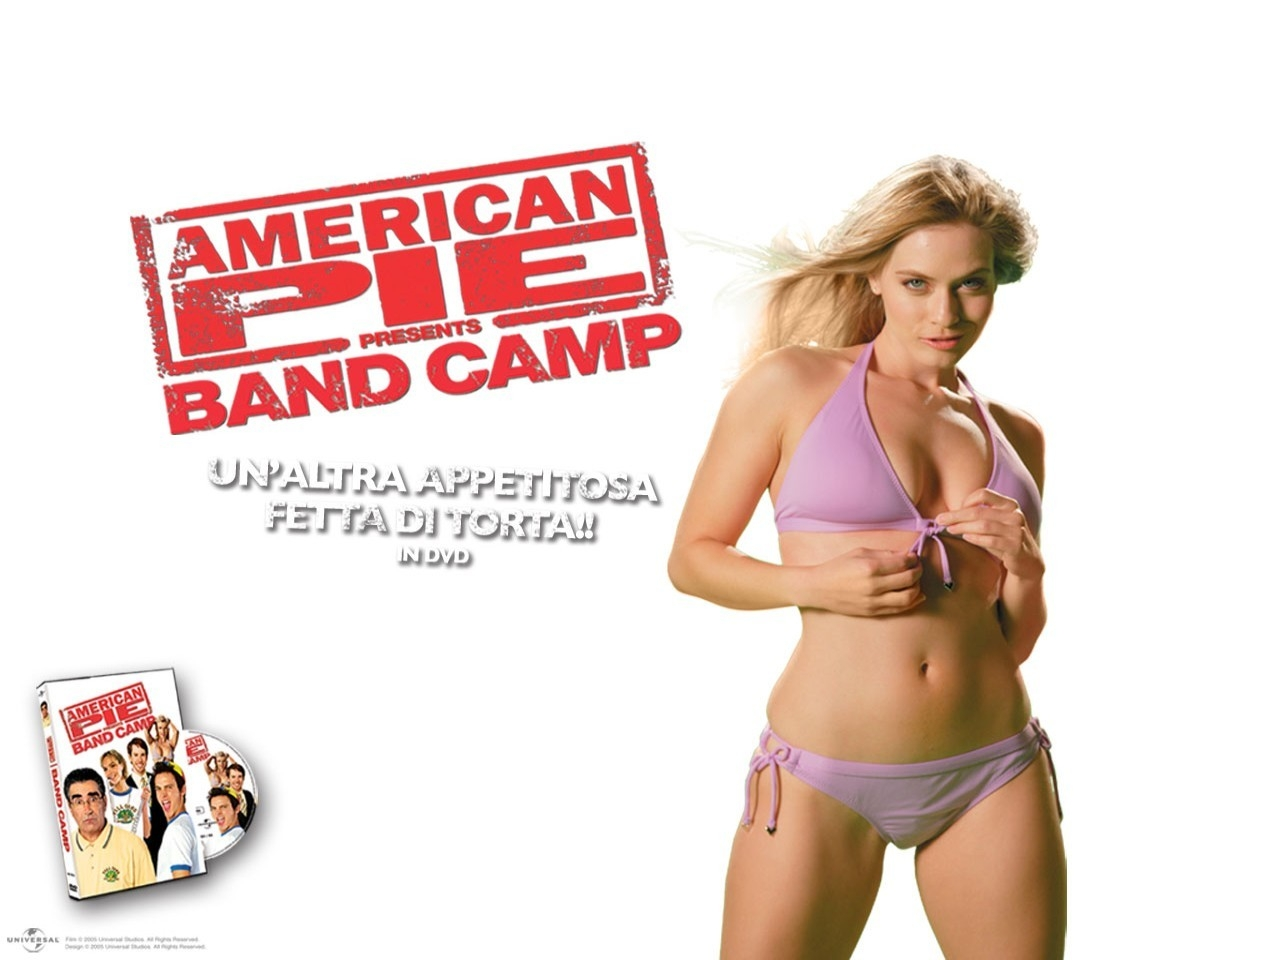 Wallpaper del film American Pie - Band Camp